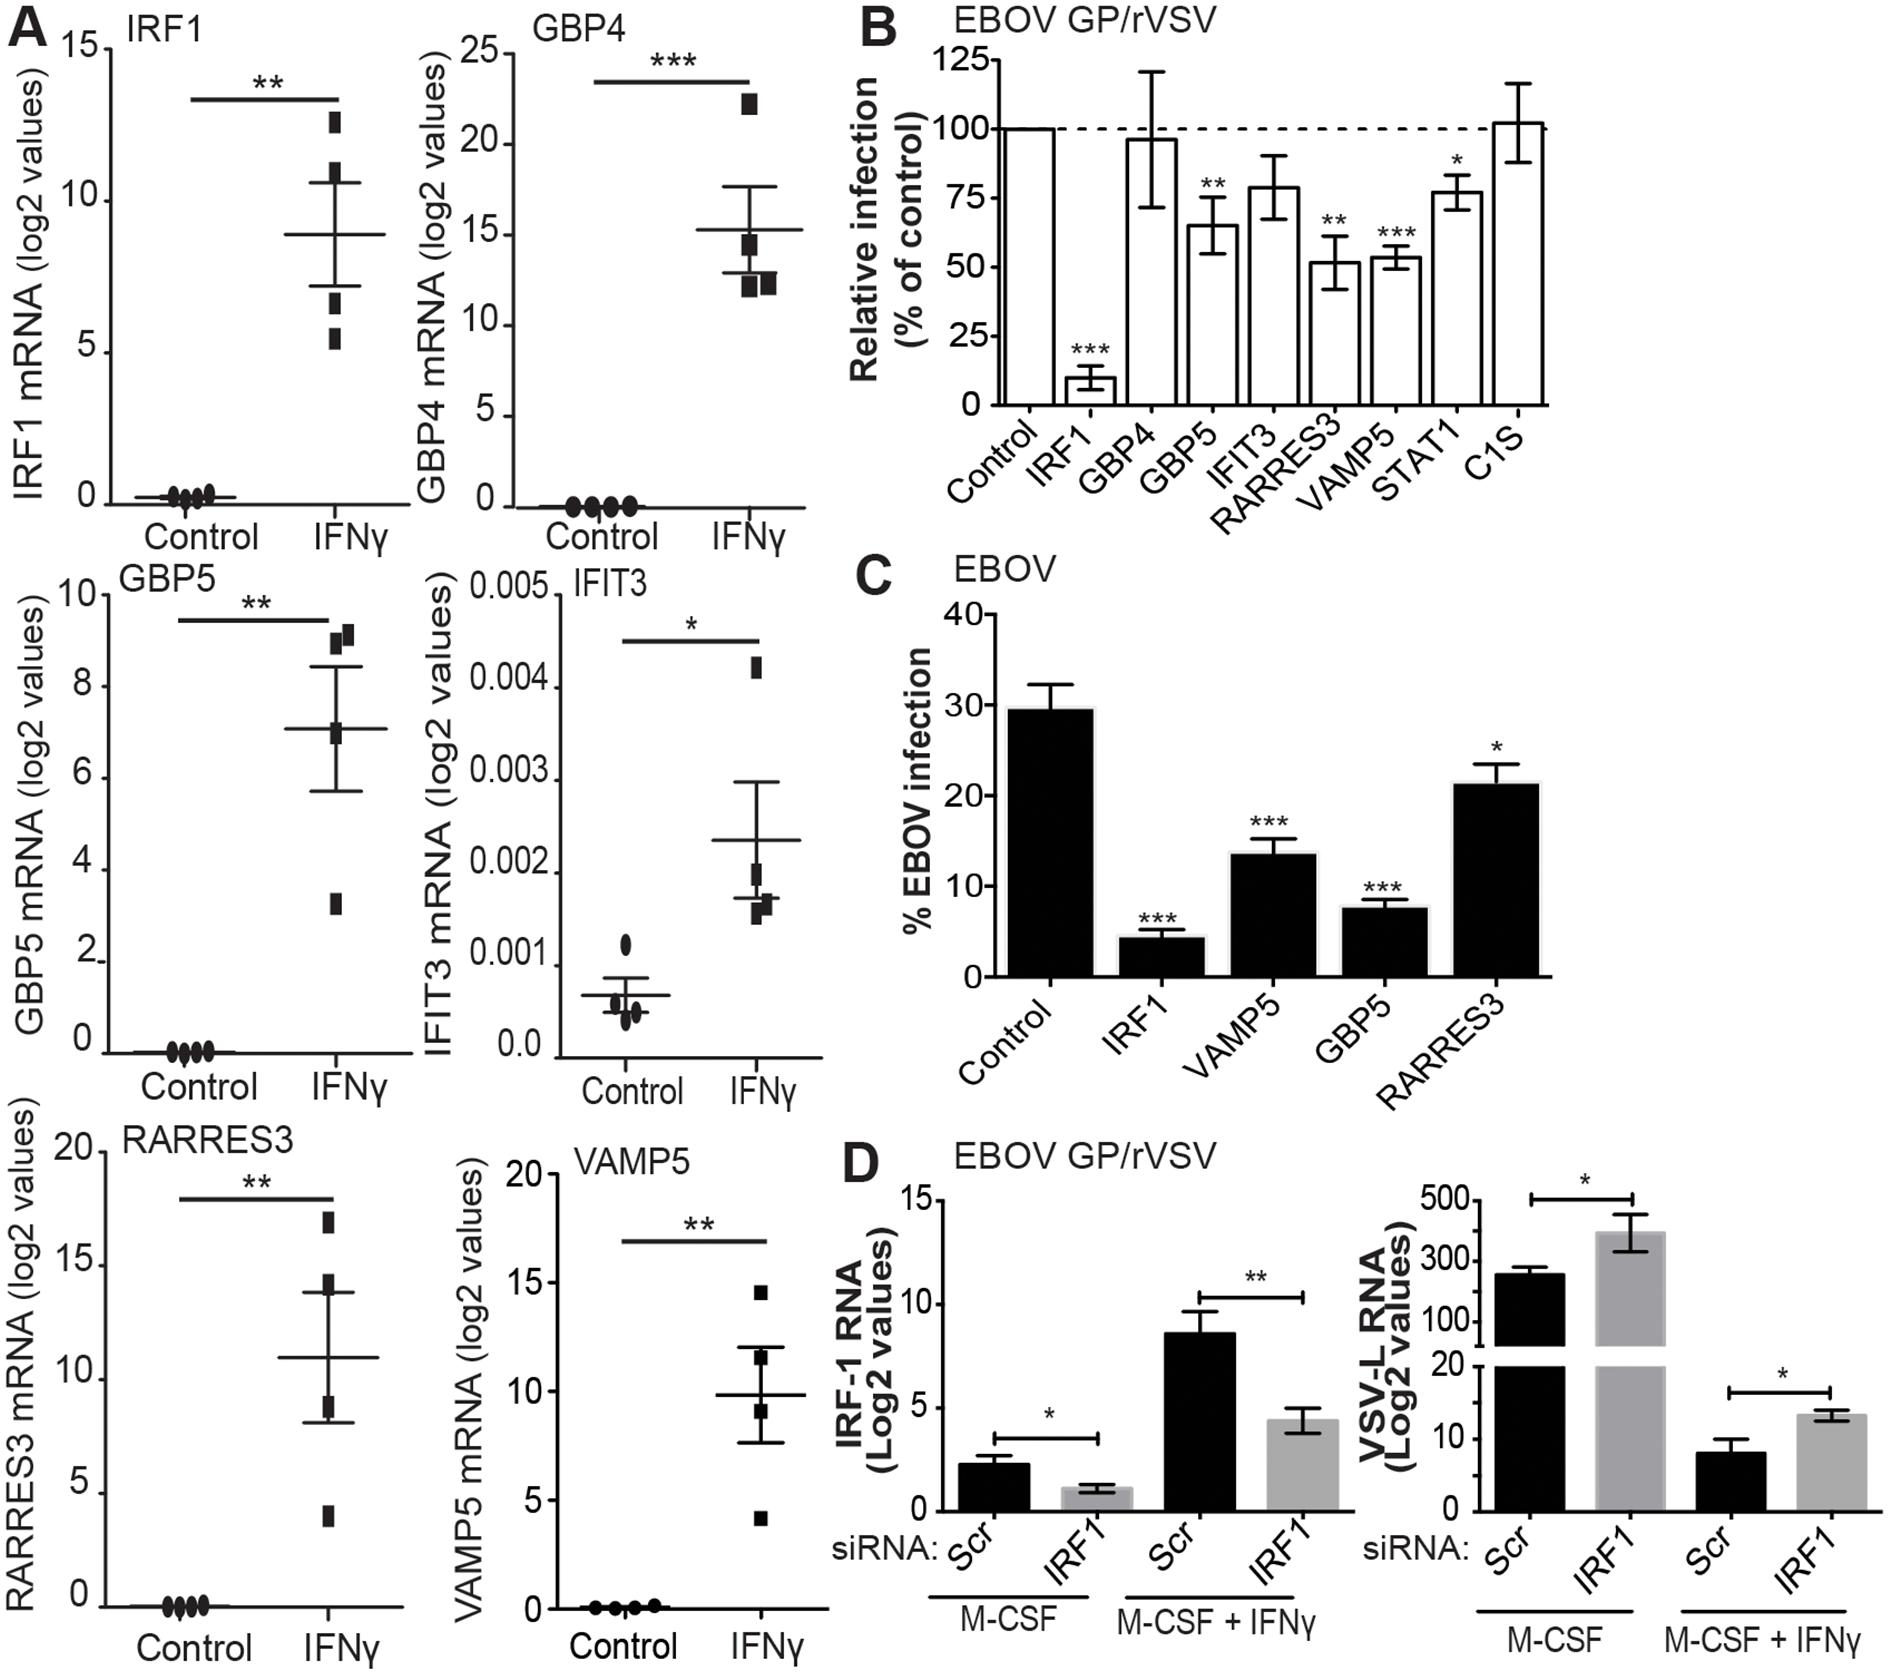 Identification of IFNγ-stimulated genes that inhibit EBOV infection.